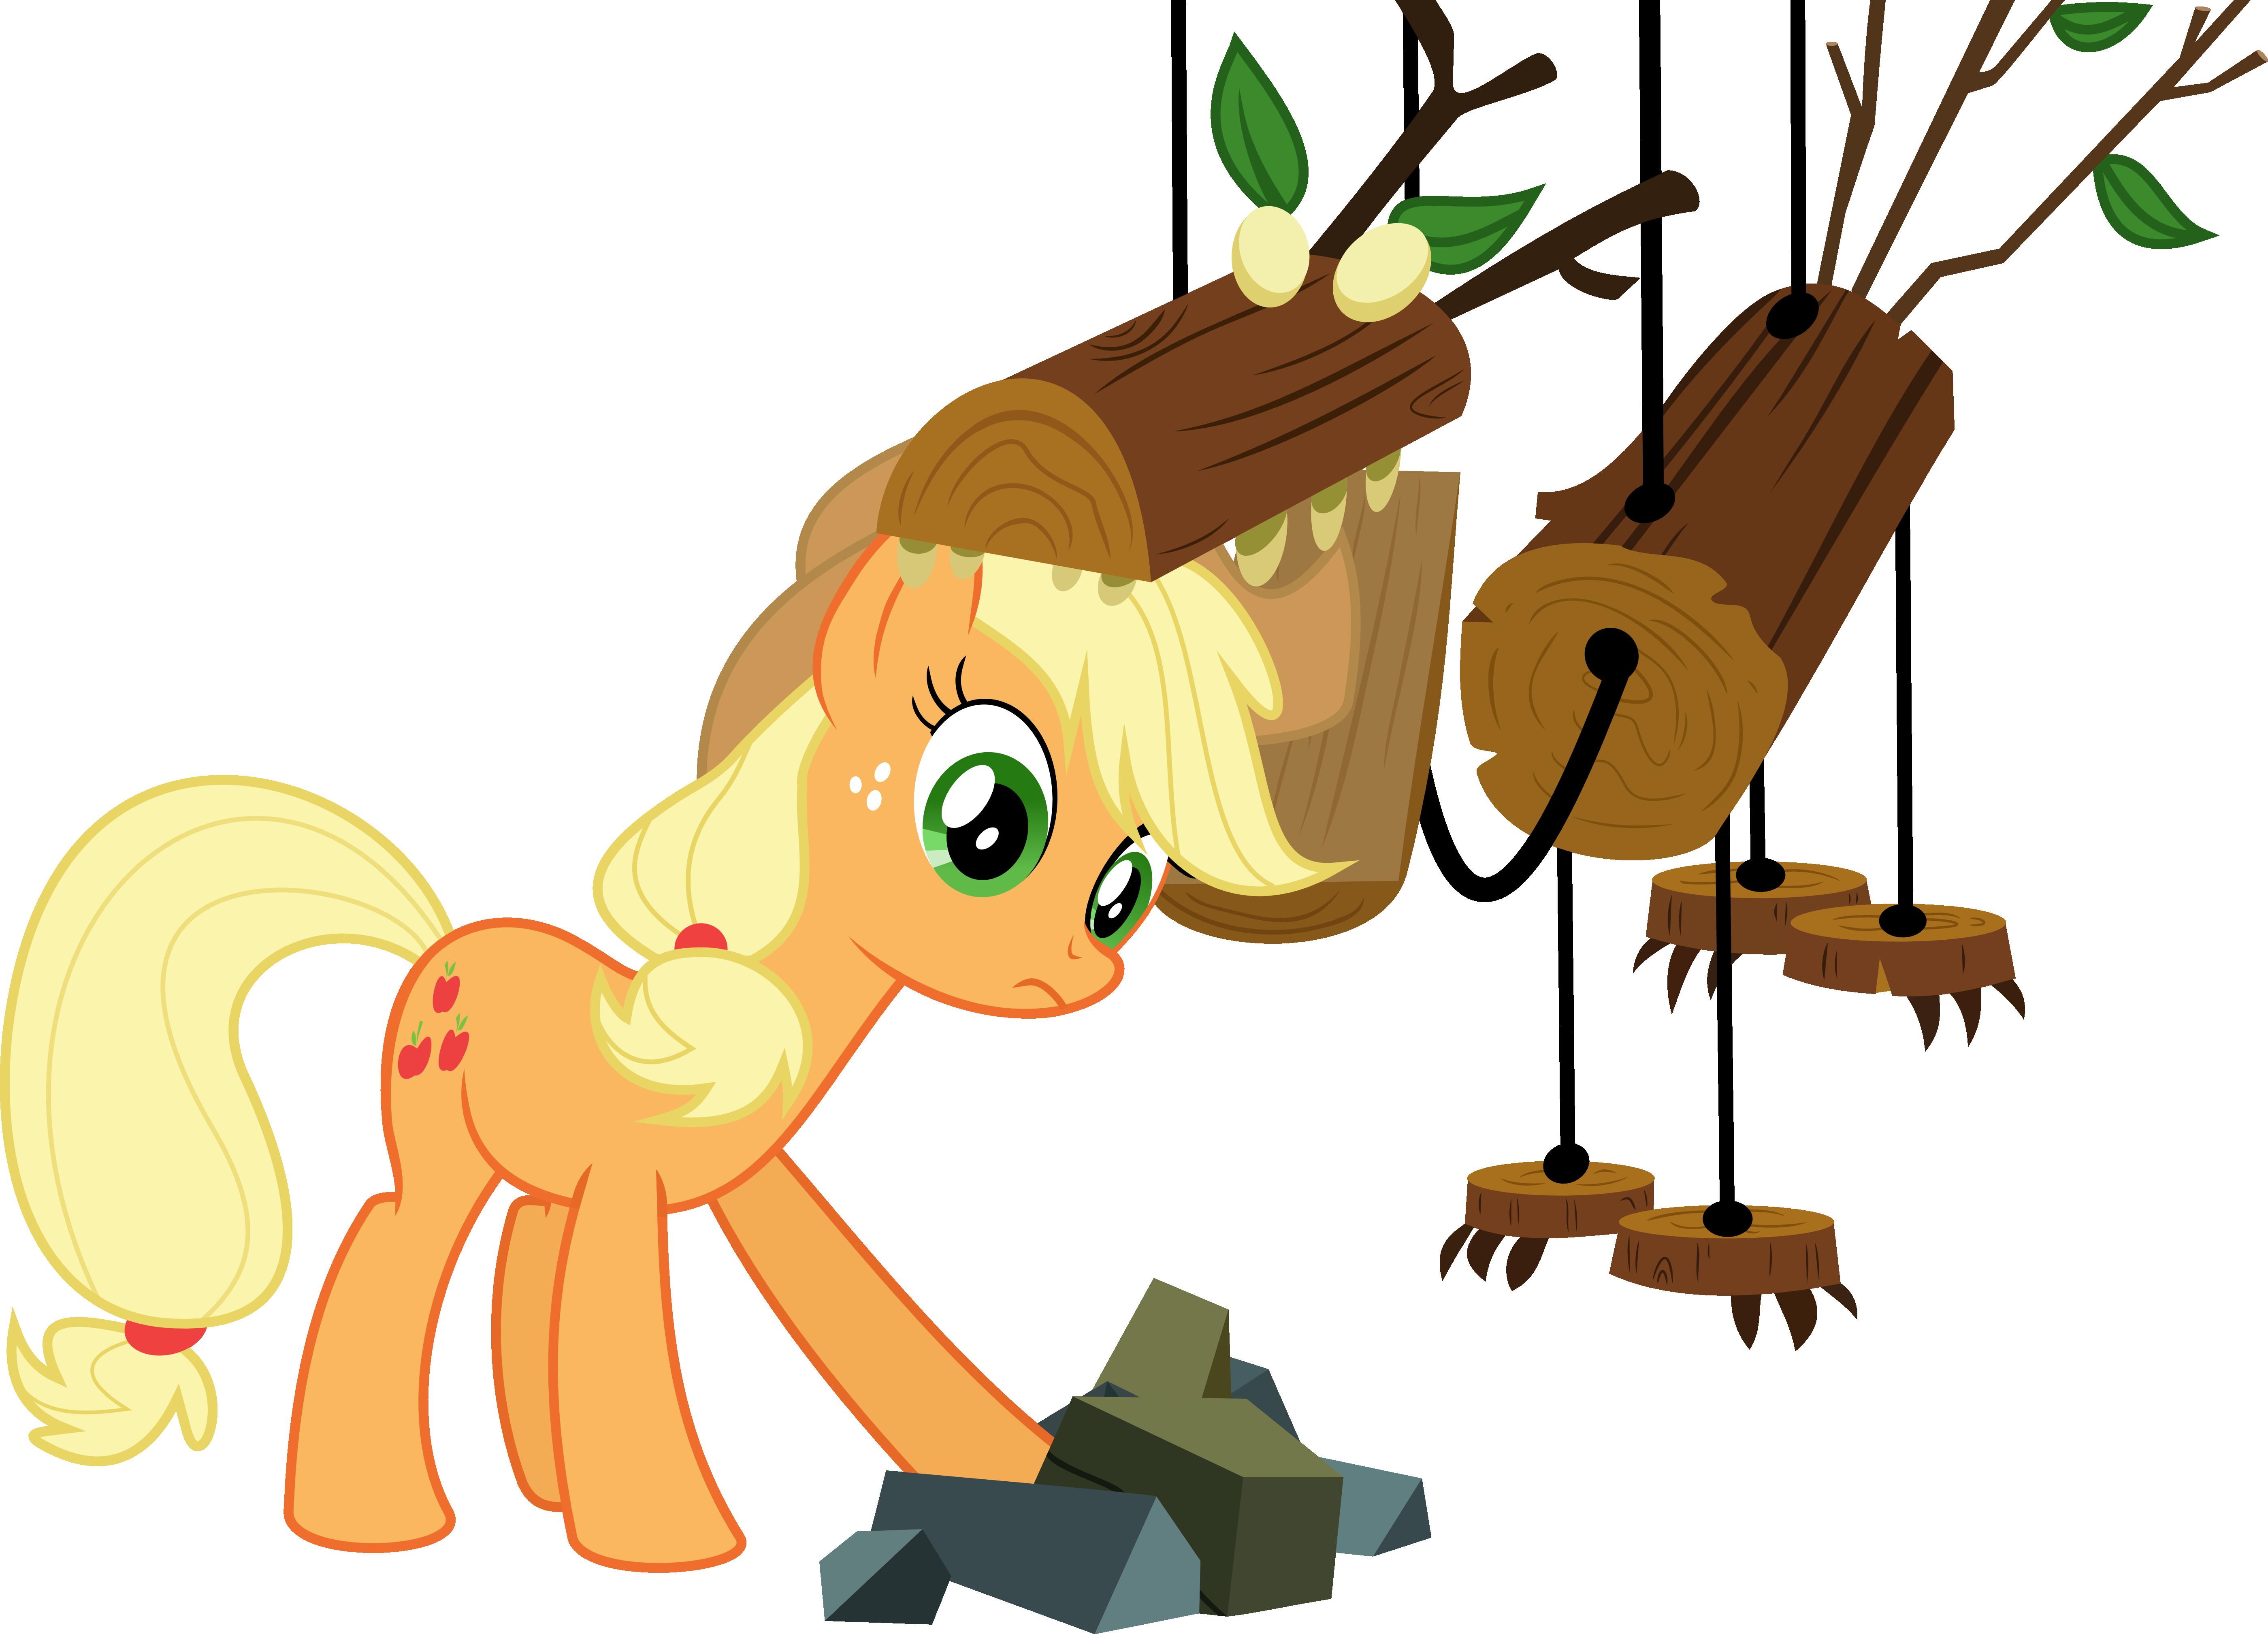 Applejack versus the Timberwolf by V0JELLY